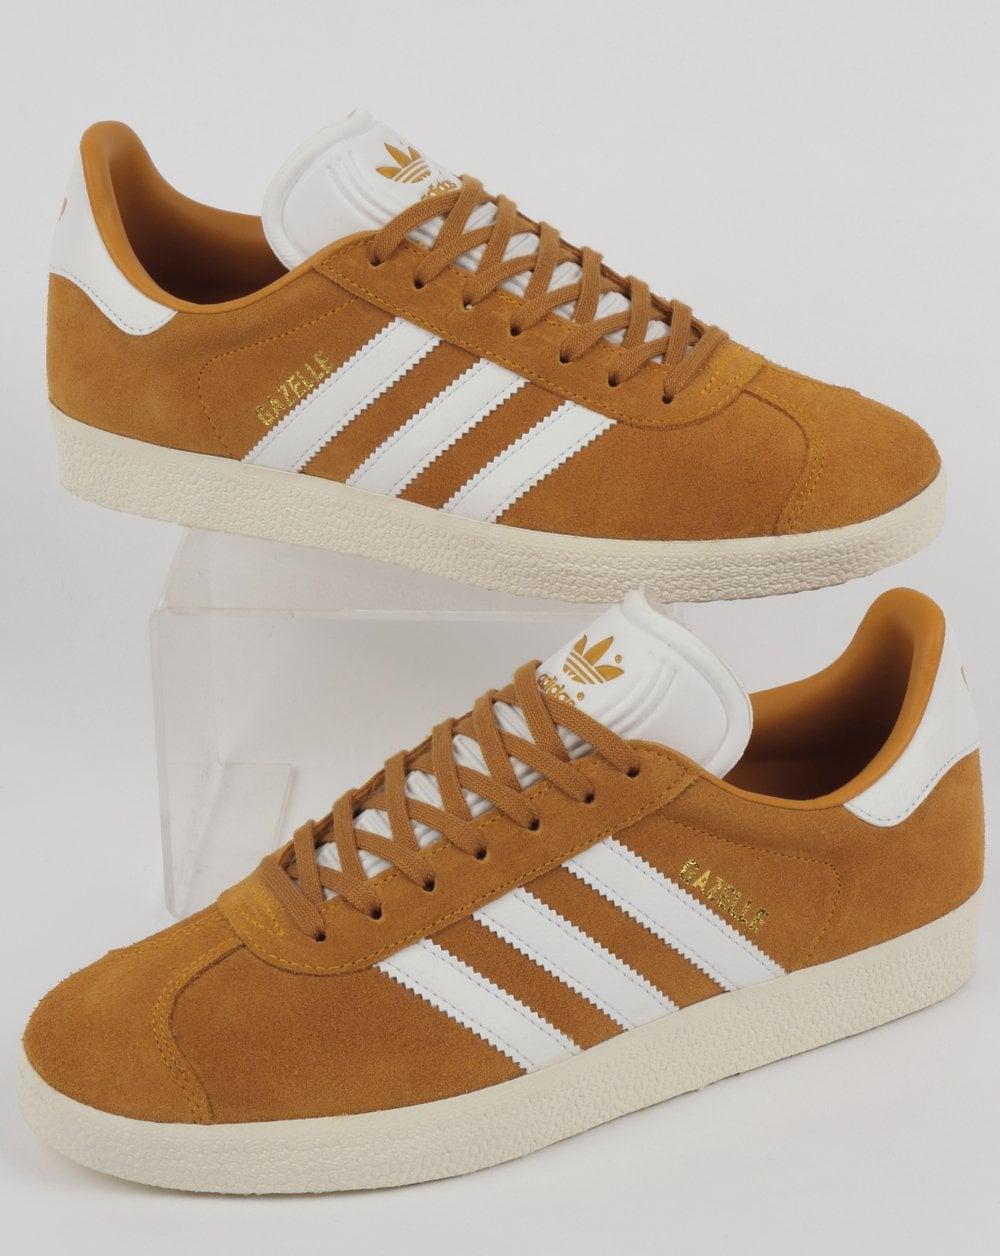 reputable site 42e2e f6615 adidas Trainers Adidas Gazelle Trainers Collegiate GoldWhite